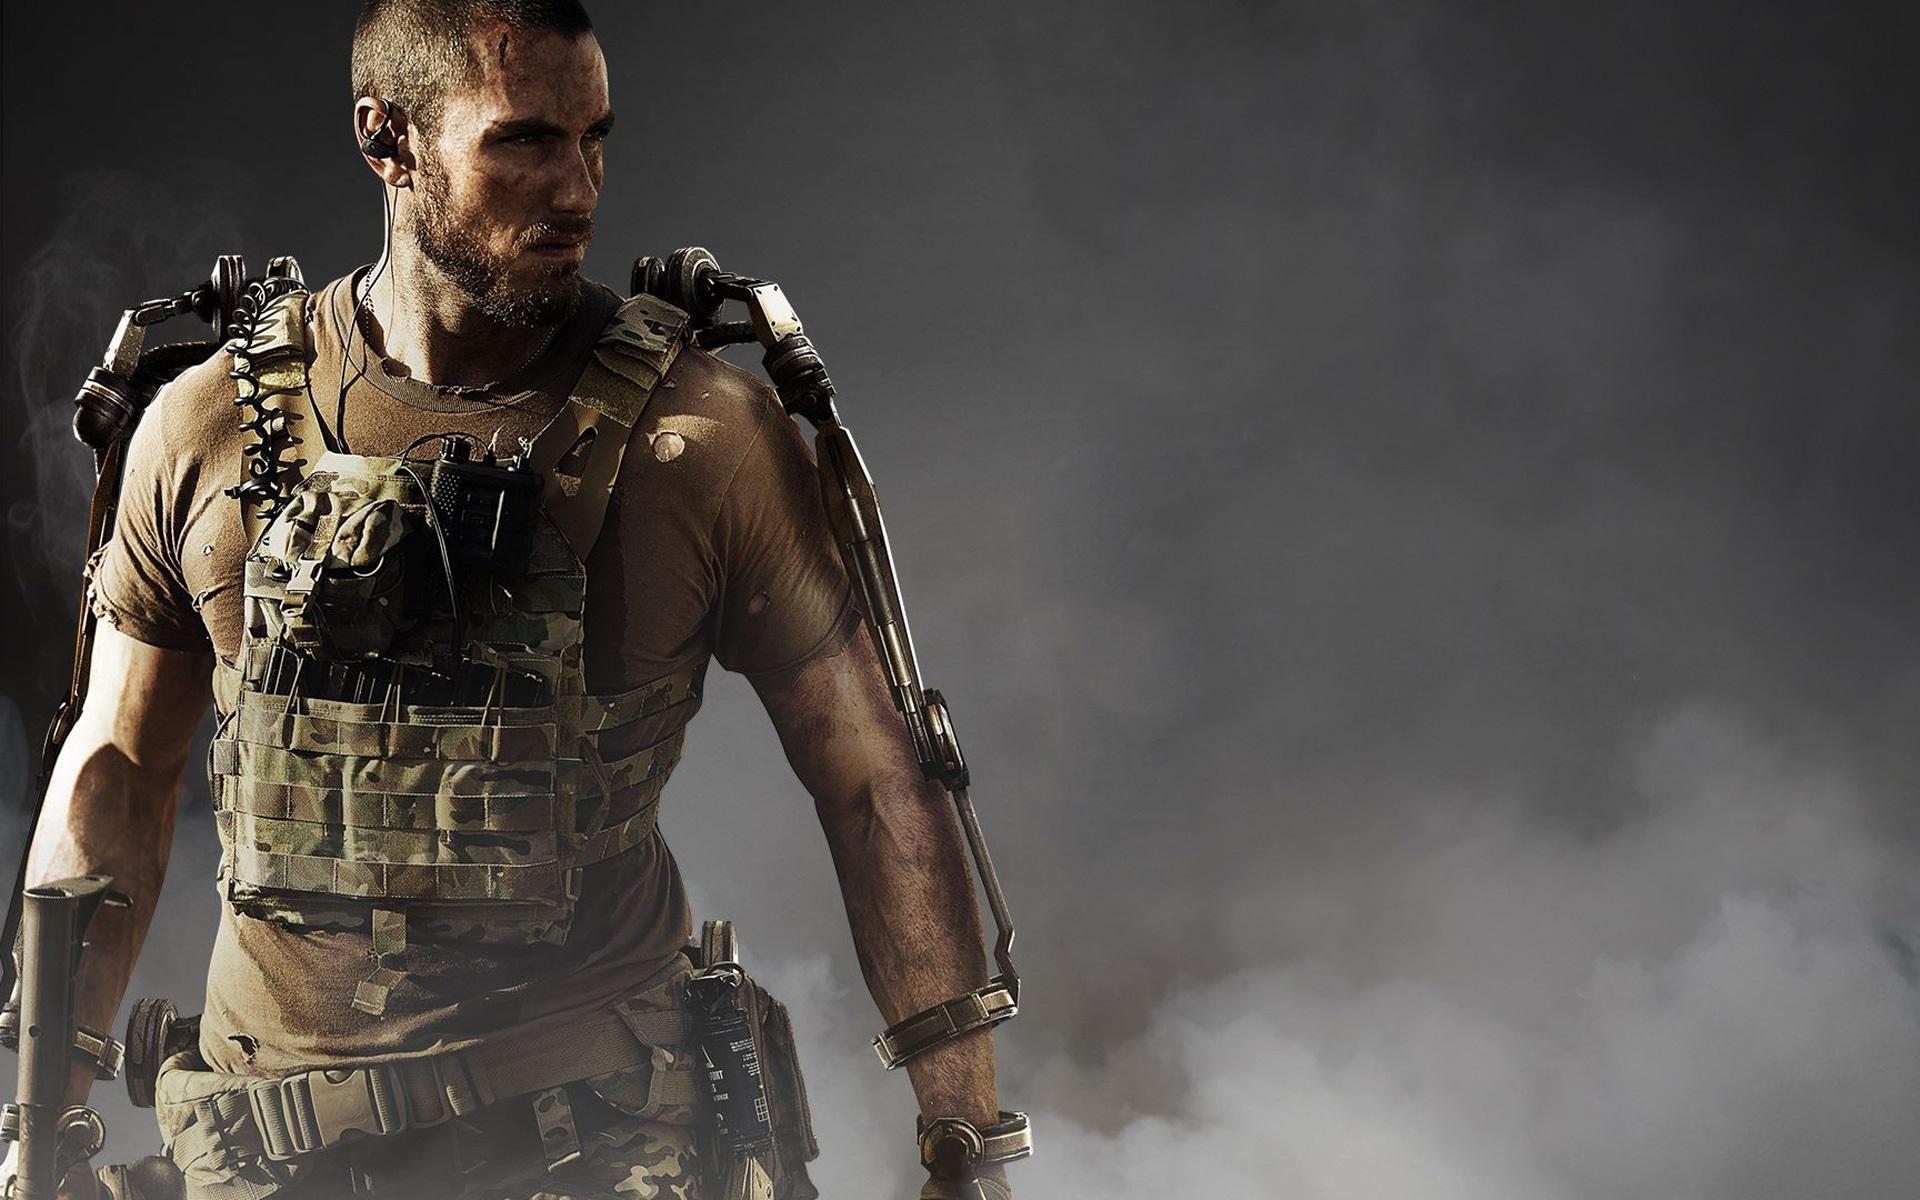 Wallpaper Call Of Duty Advanced Warfare Soldier 1920x1200